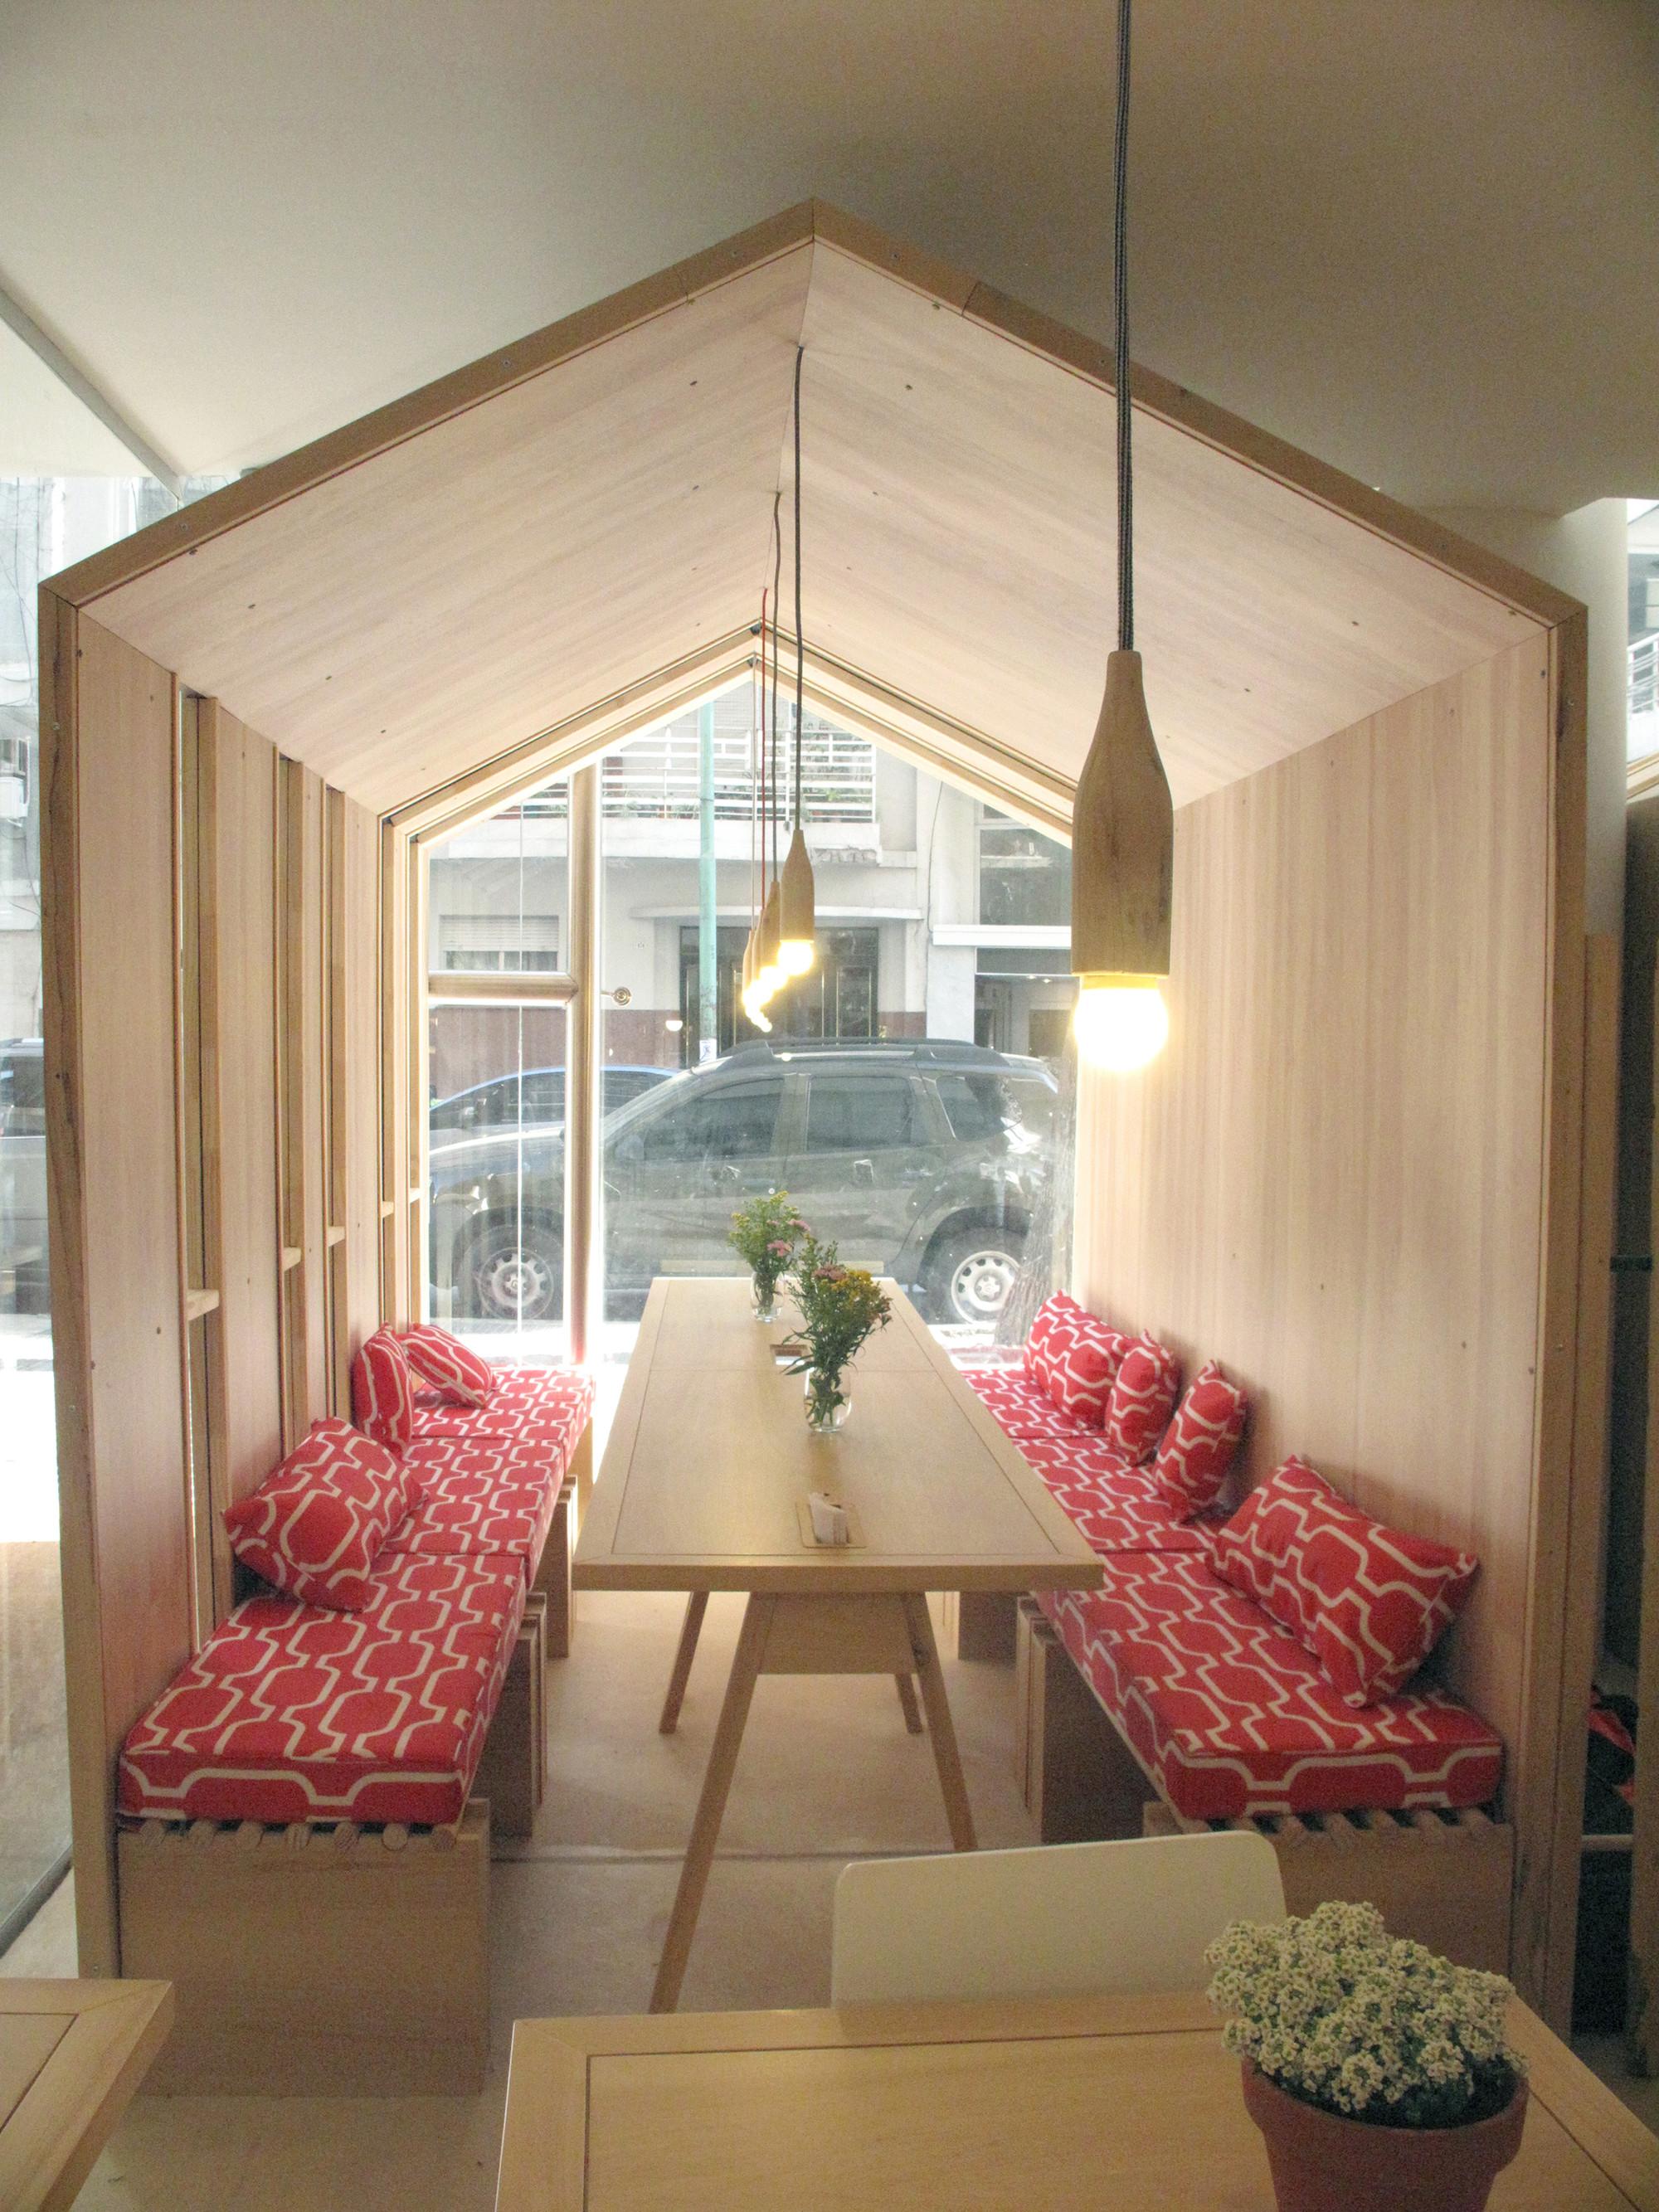 galer a de fiii fun house ris cantante 24. Black Bedroom Furniture Sets. Home Design Ideas